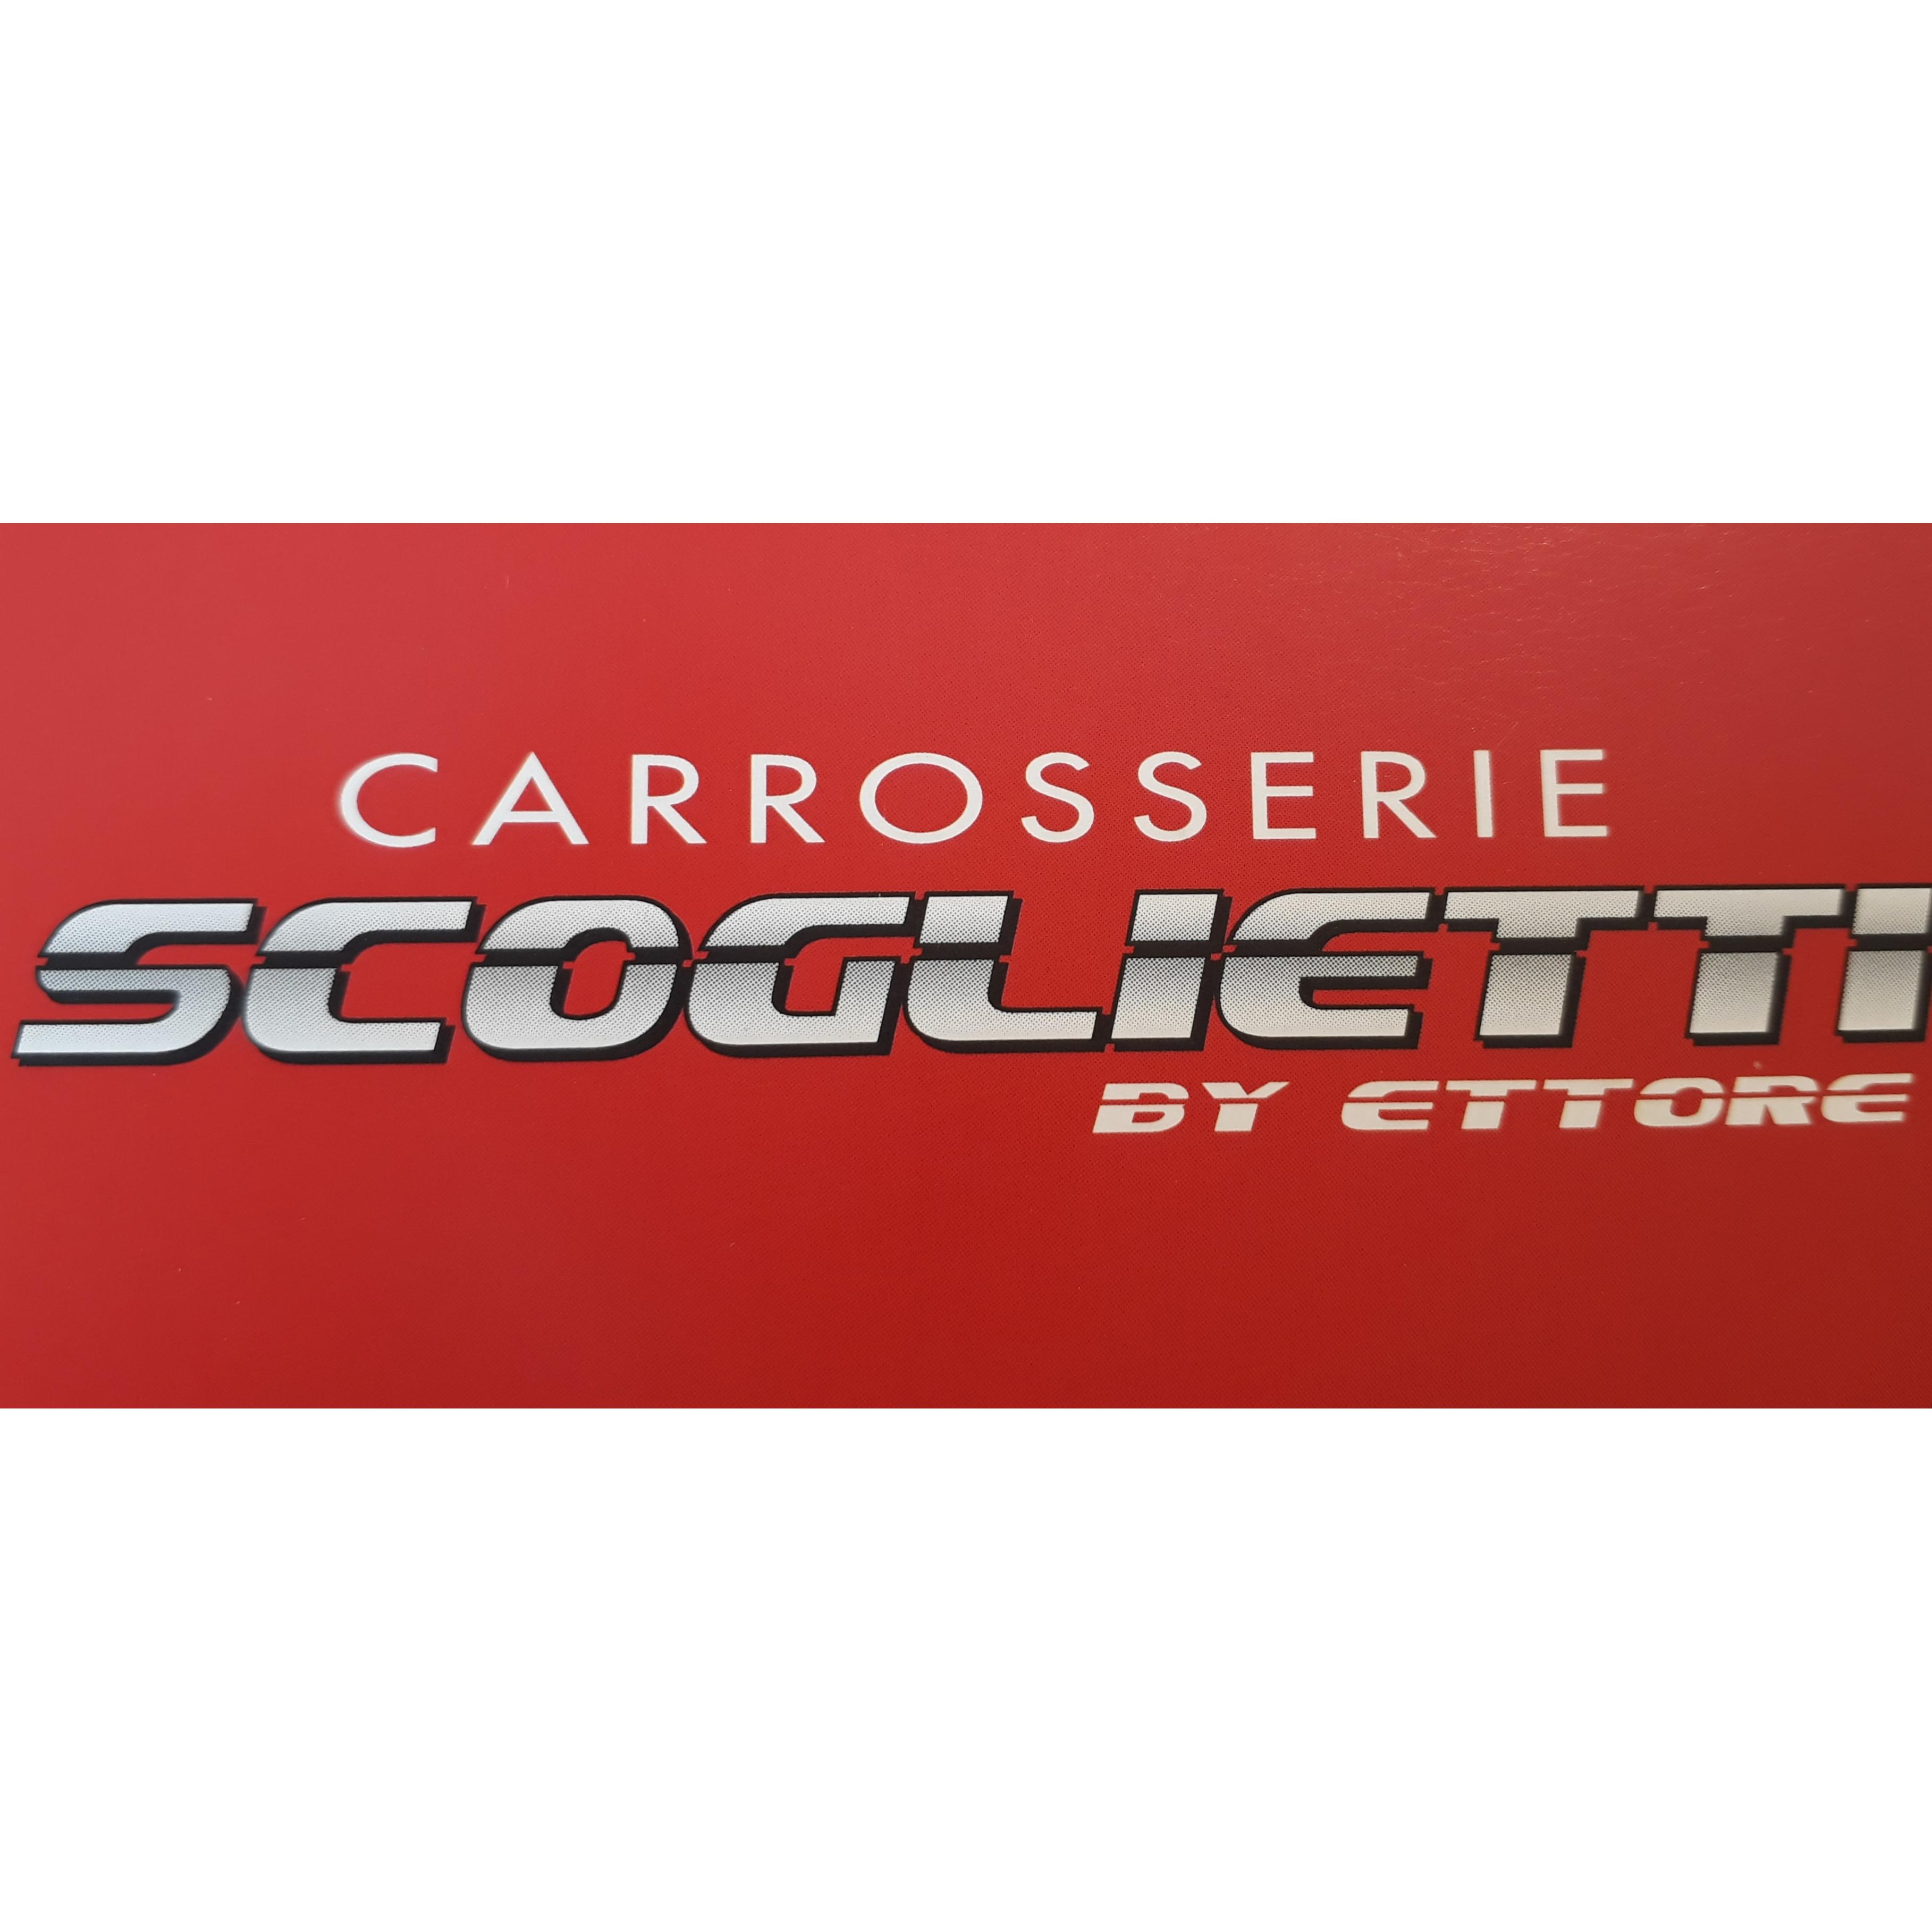 Carrosserie Scoglietti By Ettore Carrosserie Et Peinture